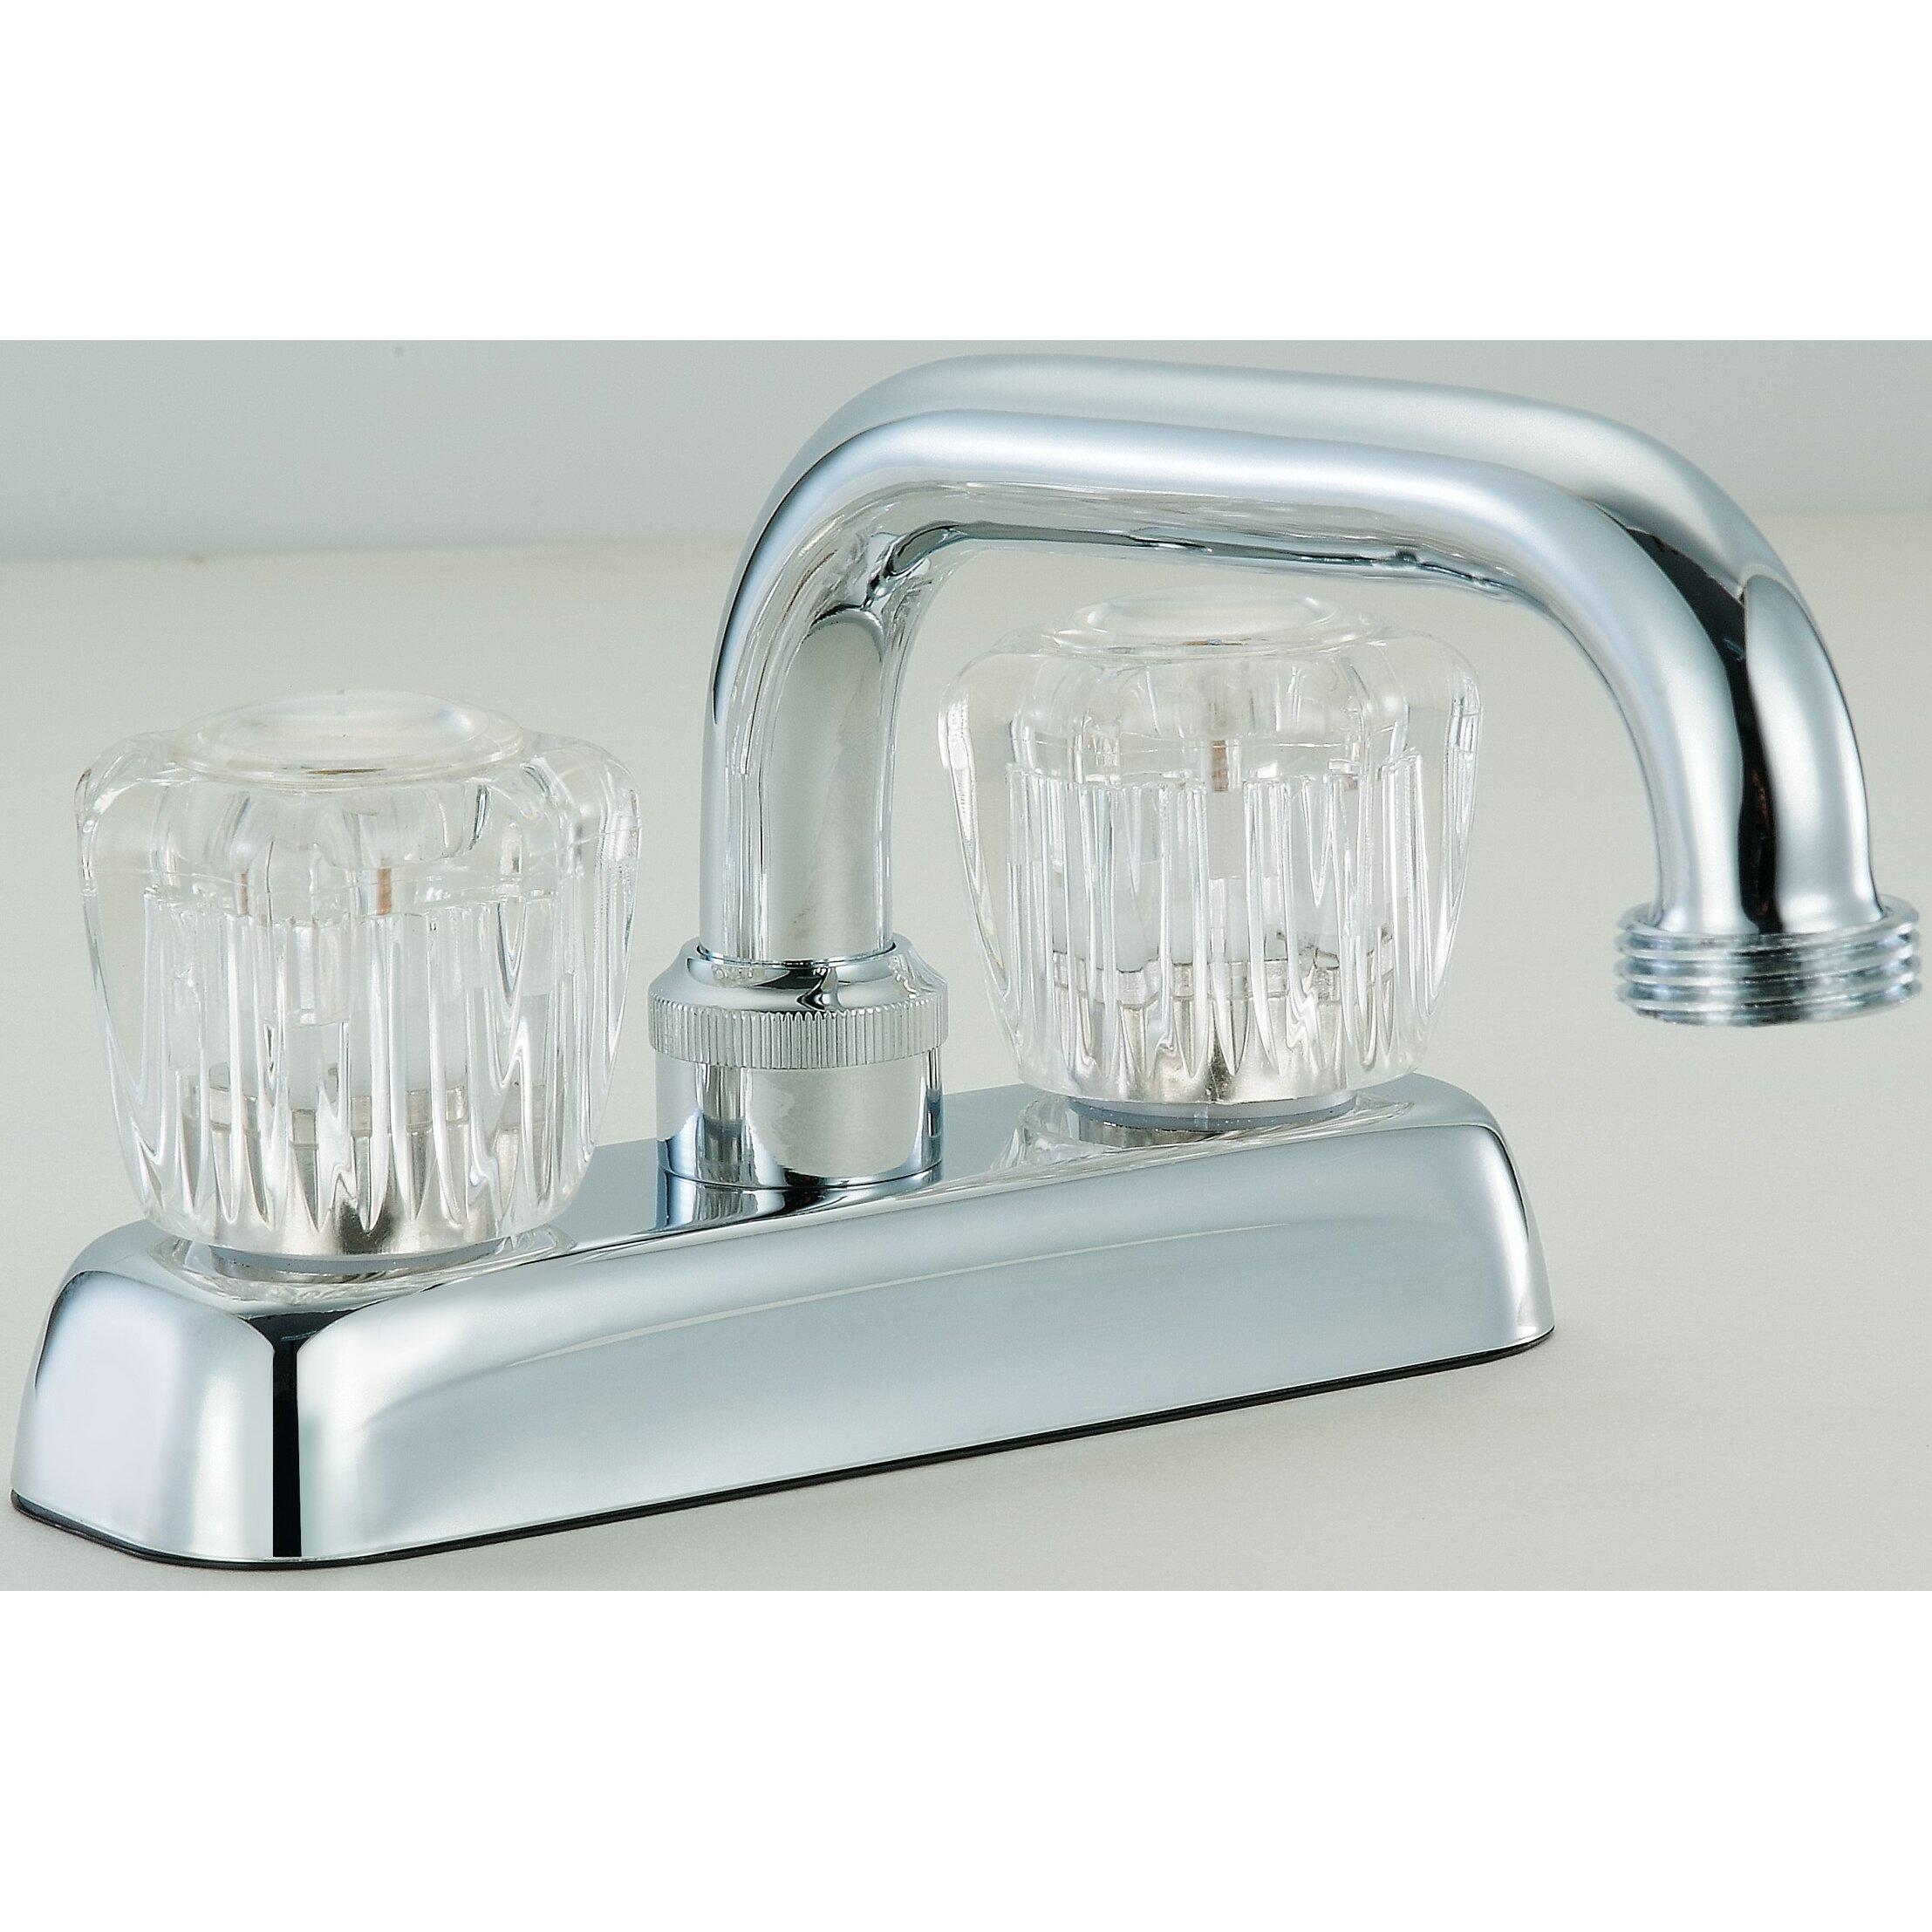 Hardware House Double Handle Centerset Bathroom Faucet Wayfair